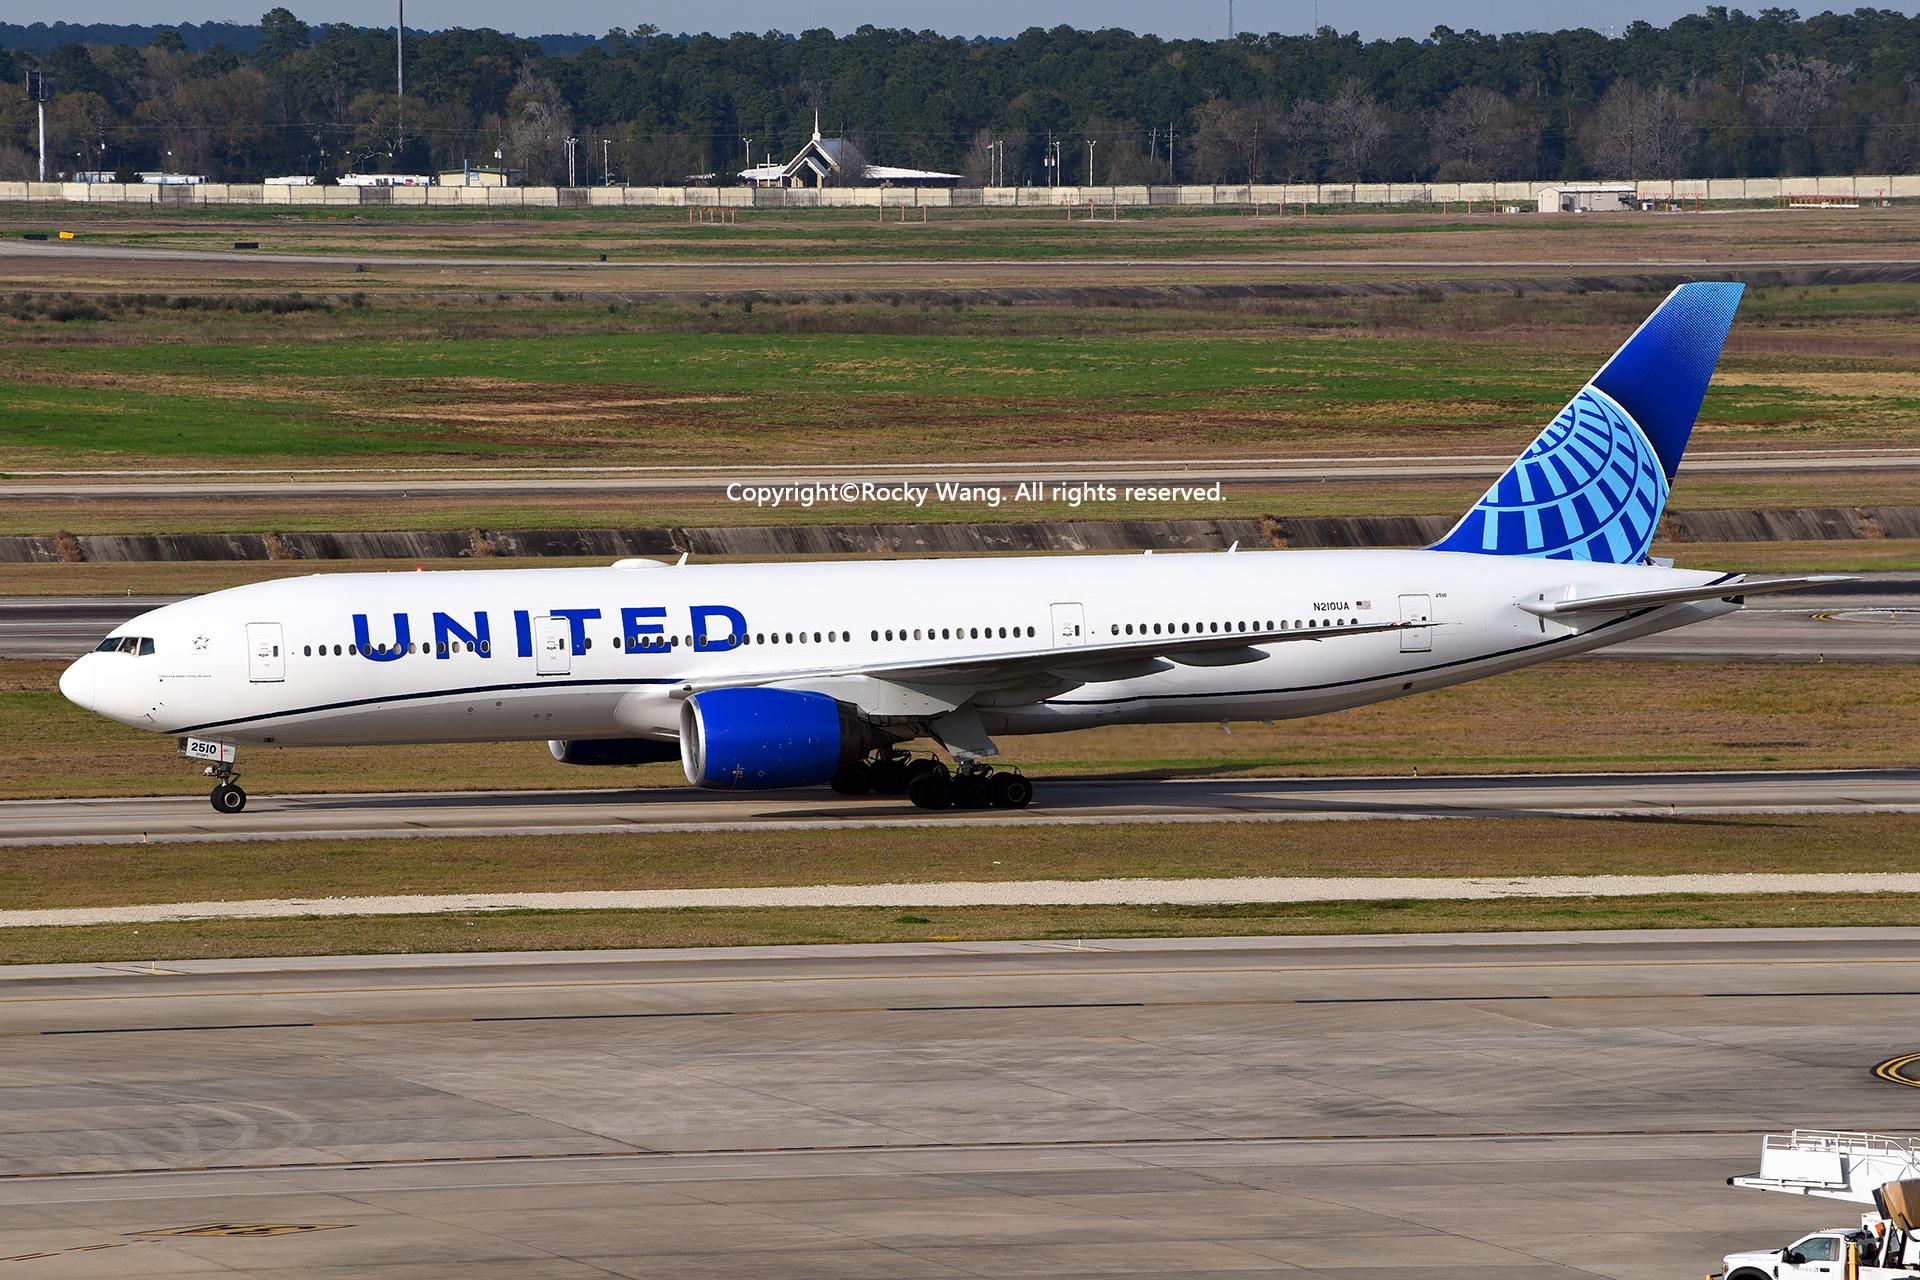 [原创]居家了 批量处理老图 倾情奉献52家777 BOEING 777-222 N210UA Houston George Bush Intercontinental Air